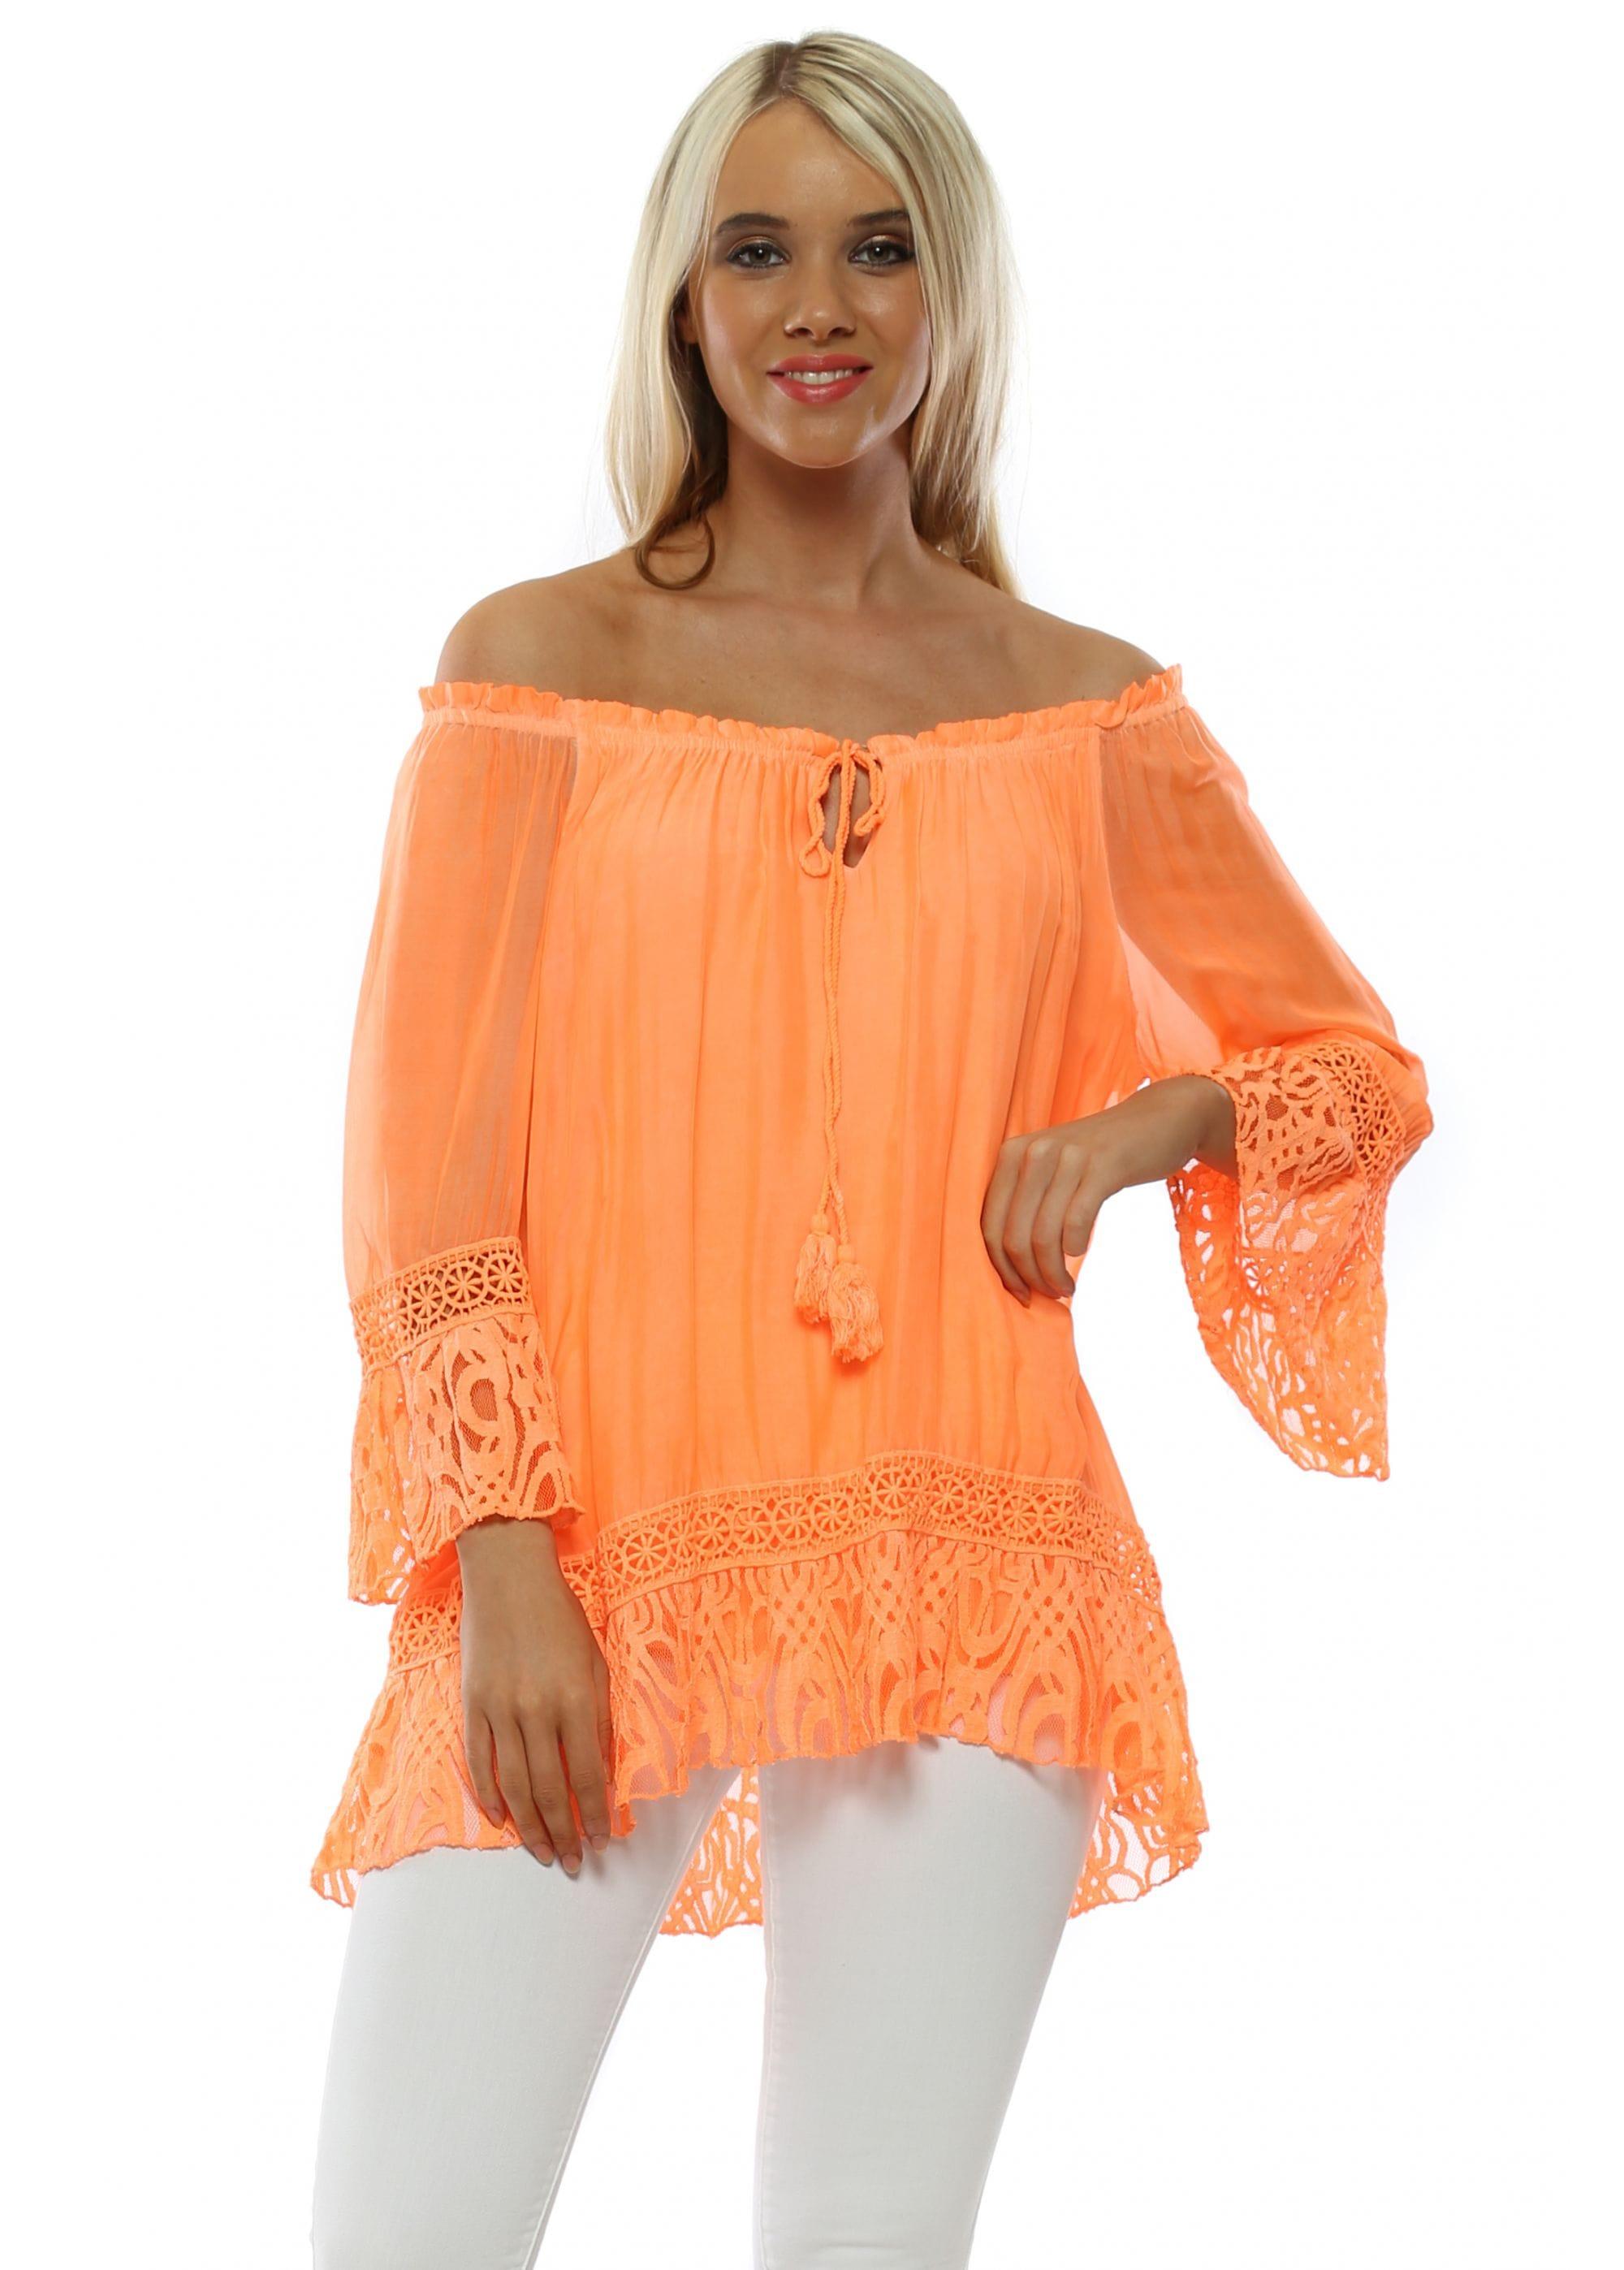 cbb376b57 Made In Italy Top   Orange Silk Bardot Top   Designer Desirables